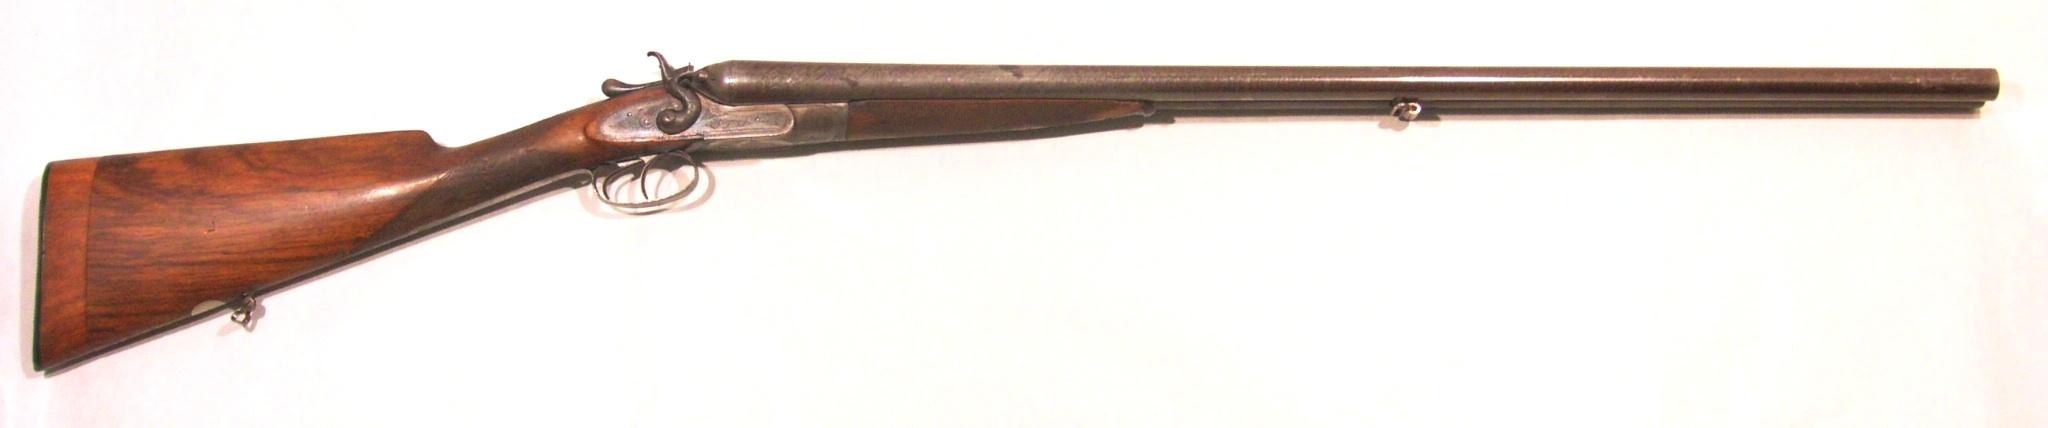 Escopeta JV NEEDHAM, modelo HAMMER DAMASCUS BARREL, calibre 12, nº 6529-0